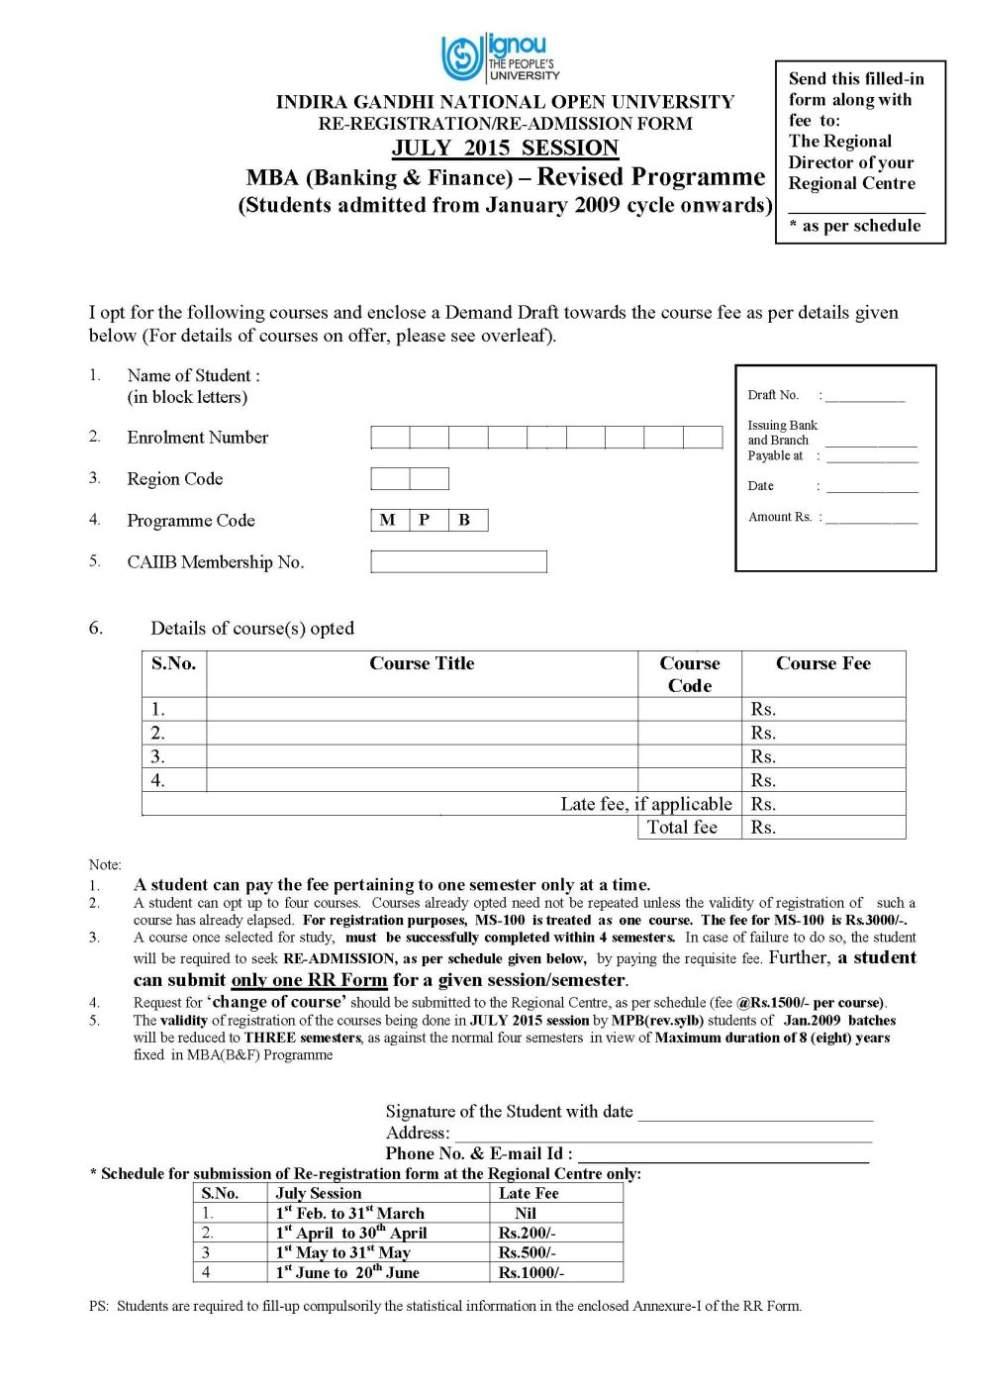 Ignou Convocation Form 2012 Pdf